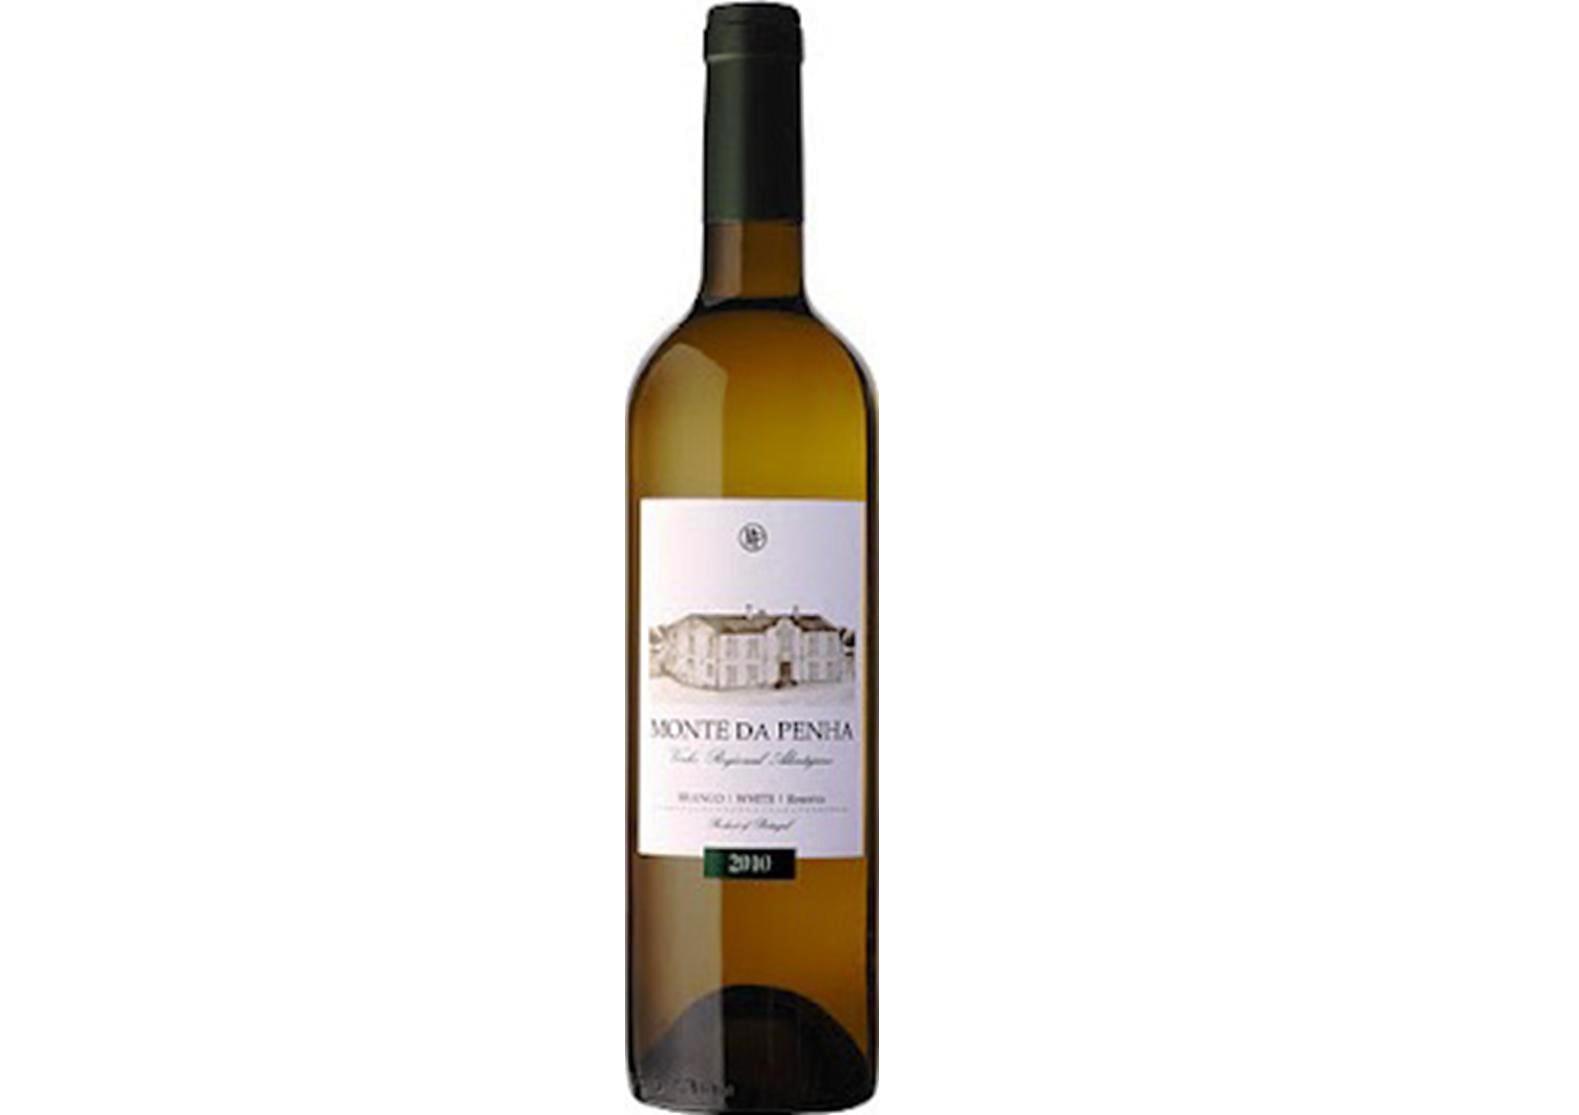 Monte da Penha Blanc - Vins de l'Alentejo Portugal